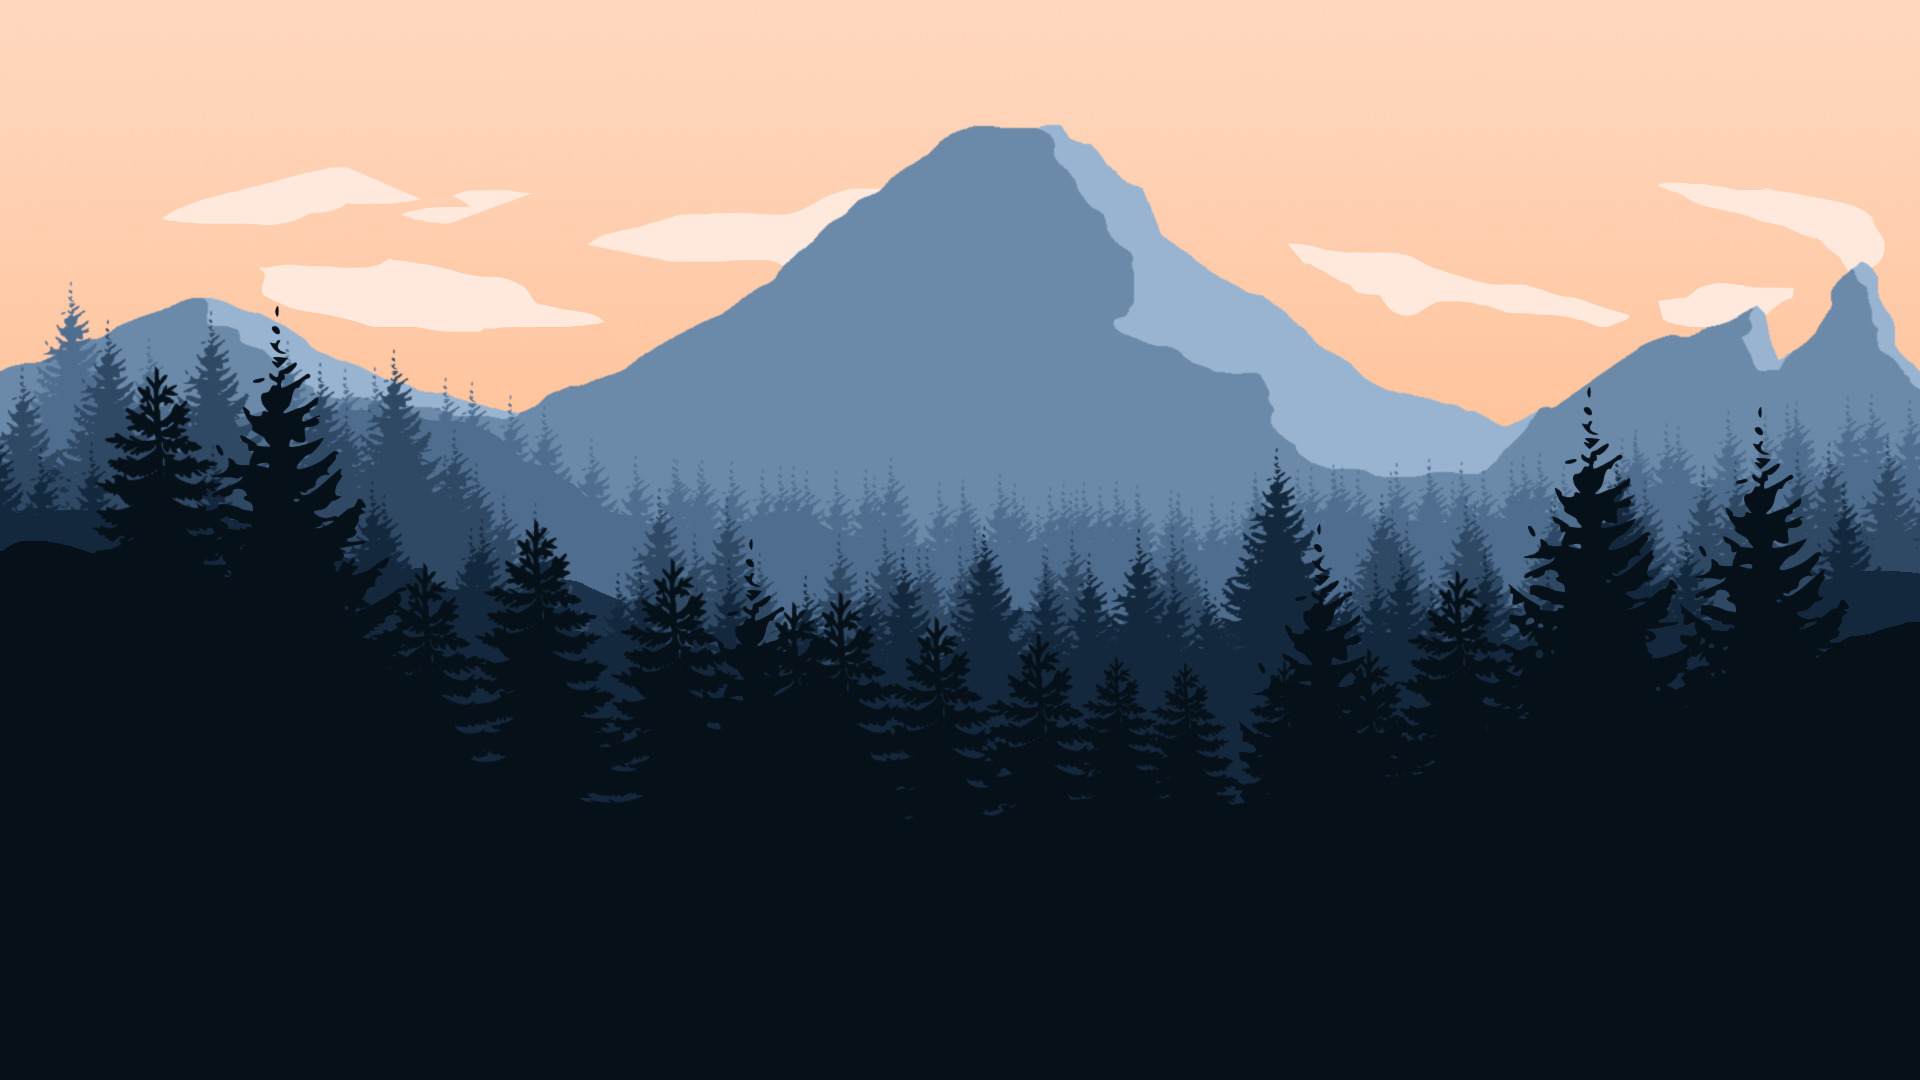 Gravity Falls Landscapes Wallpaper Firewatch Mountains Forest Sky Landscape Artwork